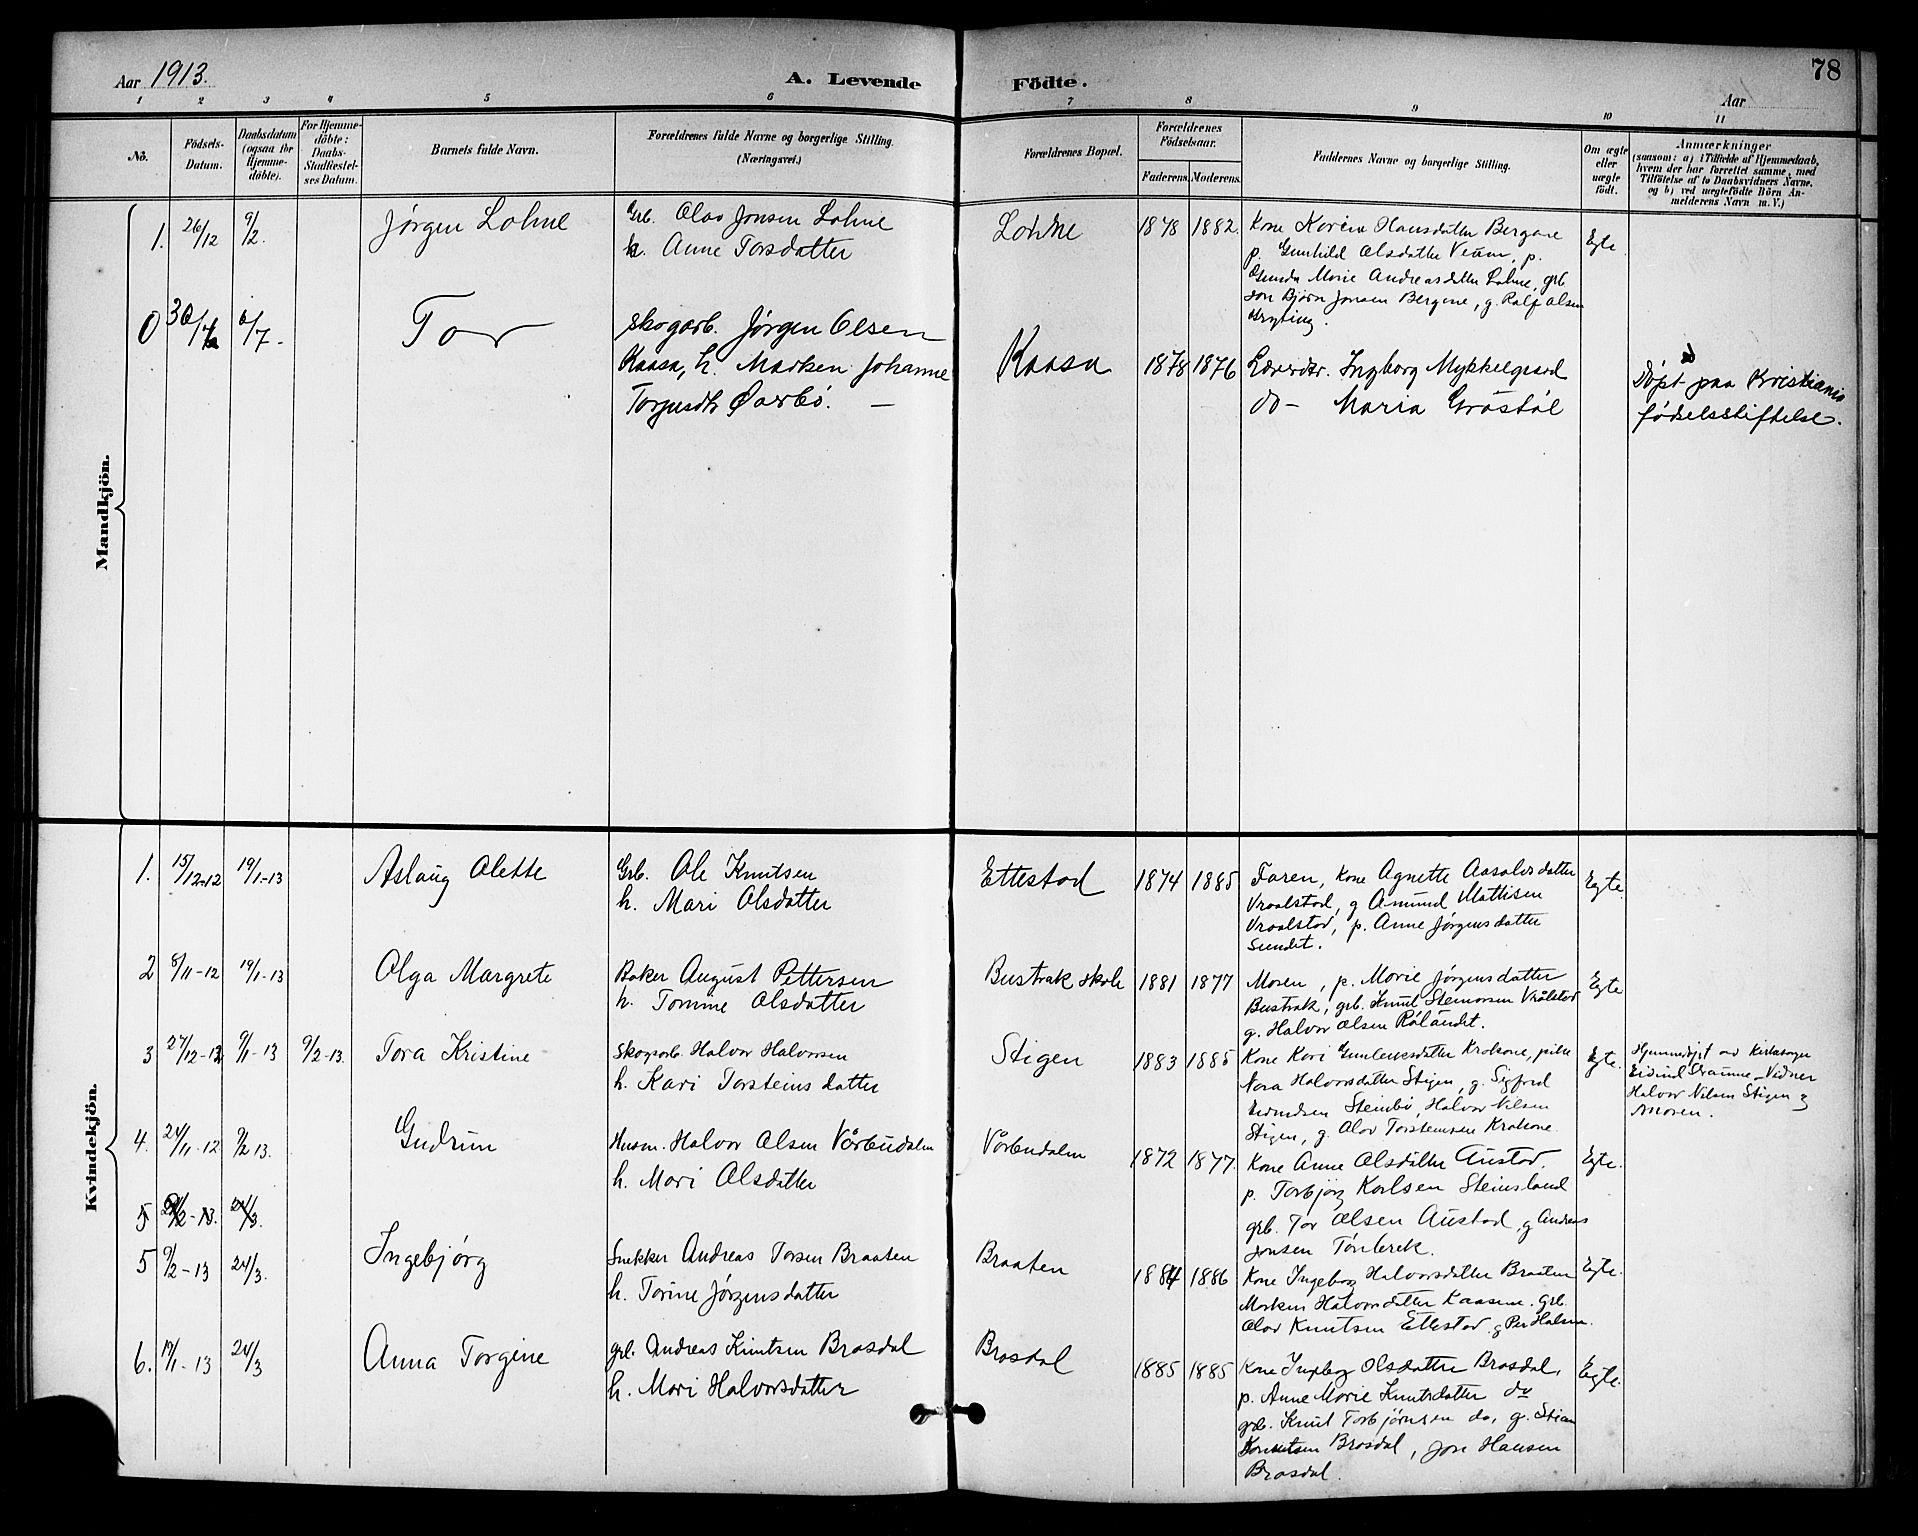 SAKO, Drangedal kirkebøker, G/Gb/L0002: Klokkerbok nr. II 2, 1895-1918, s. 78